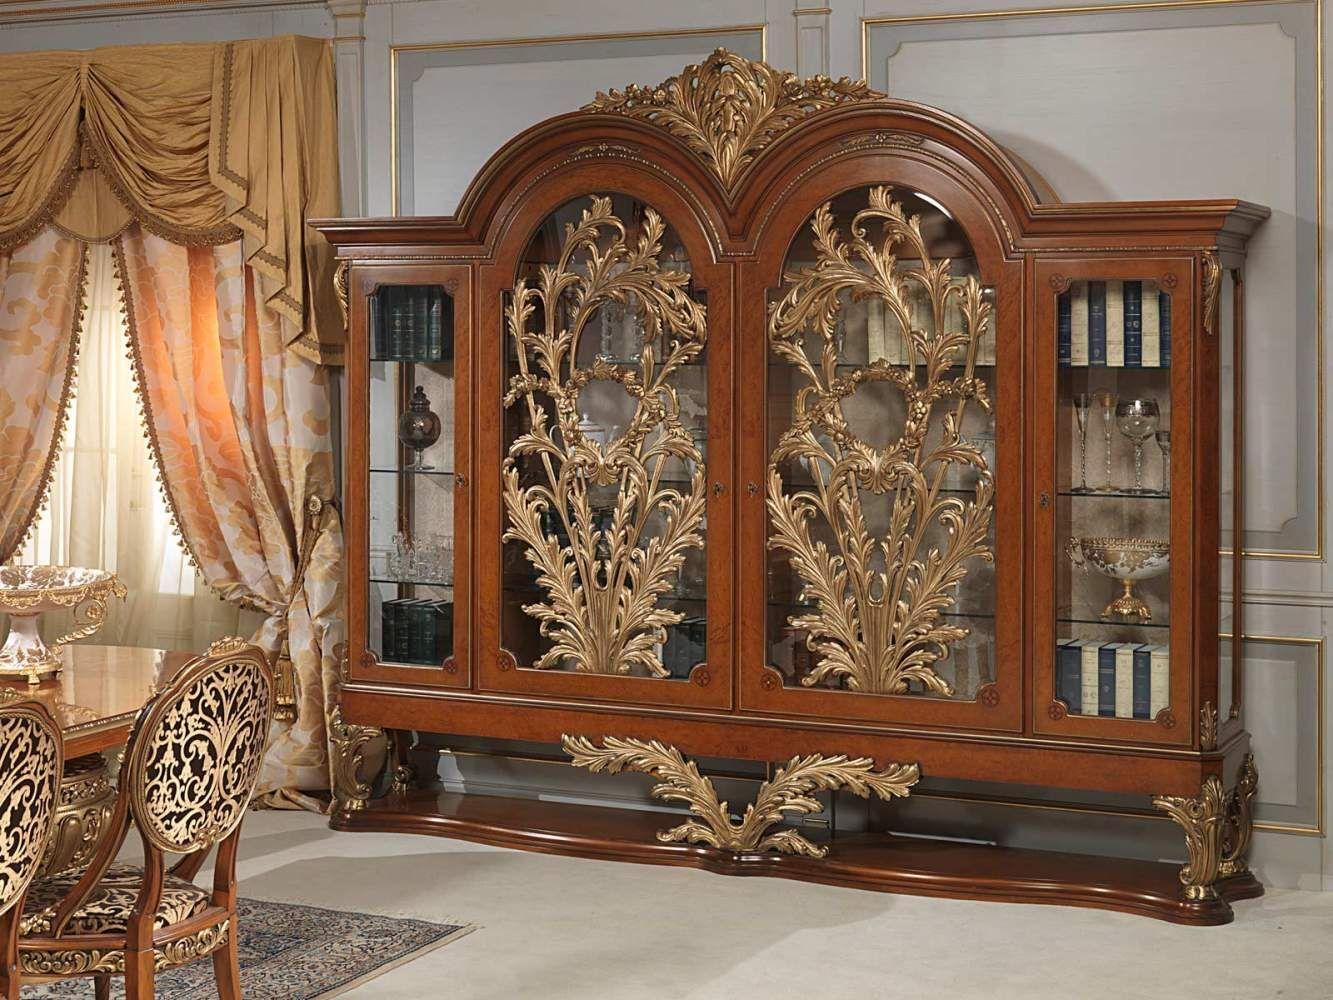 Vetrina Versailles in stile Luigi XVI жидкий метал на стекле ...